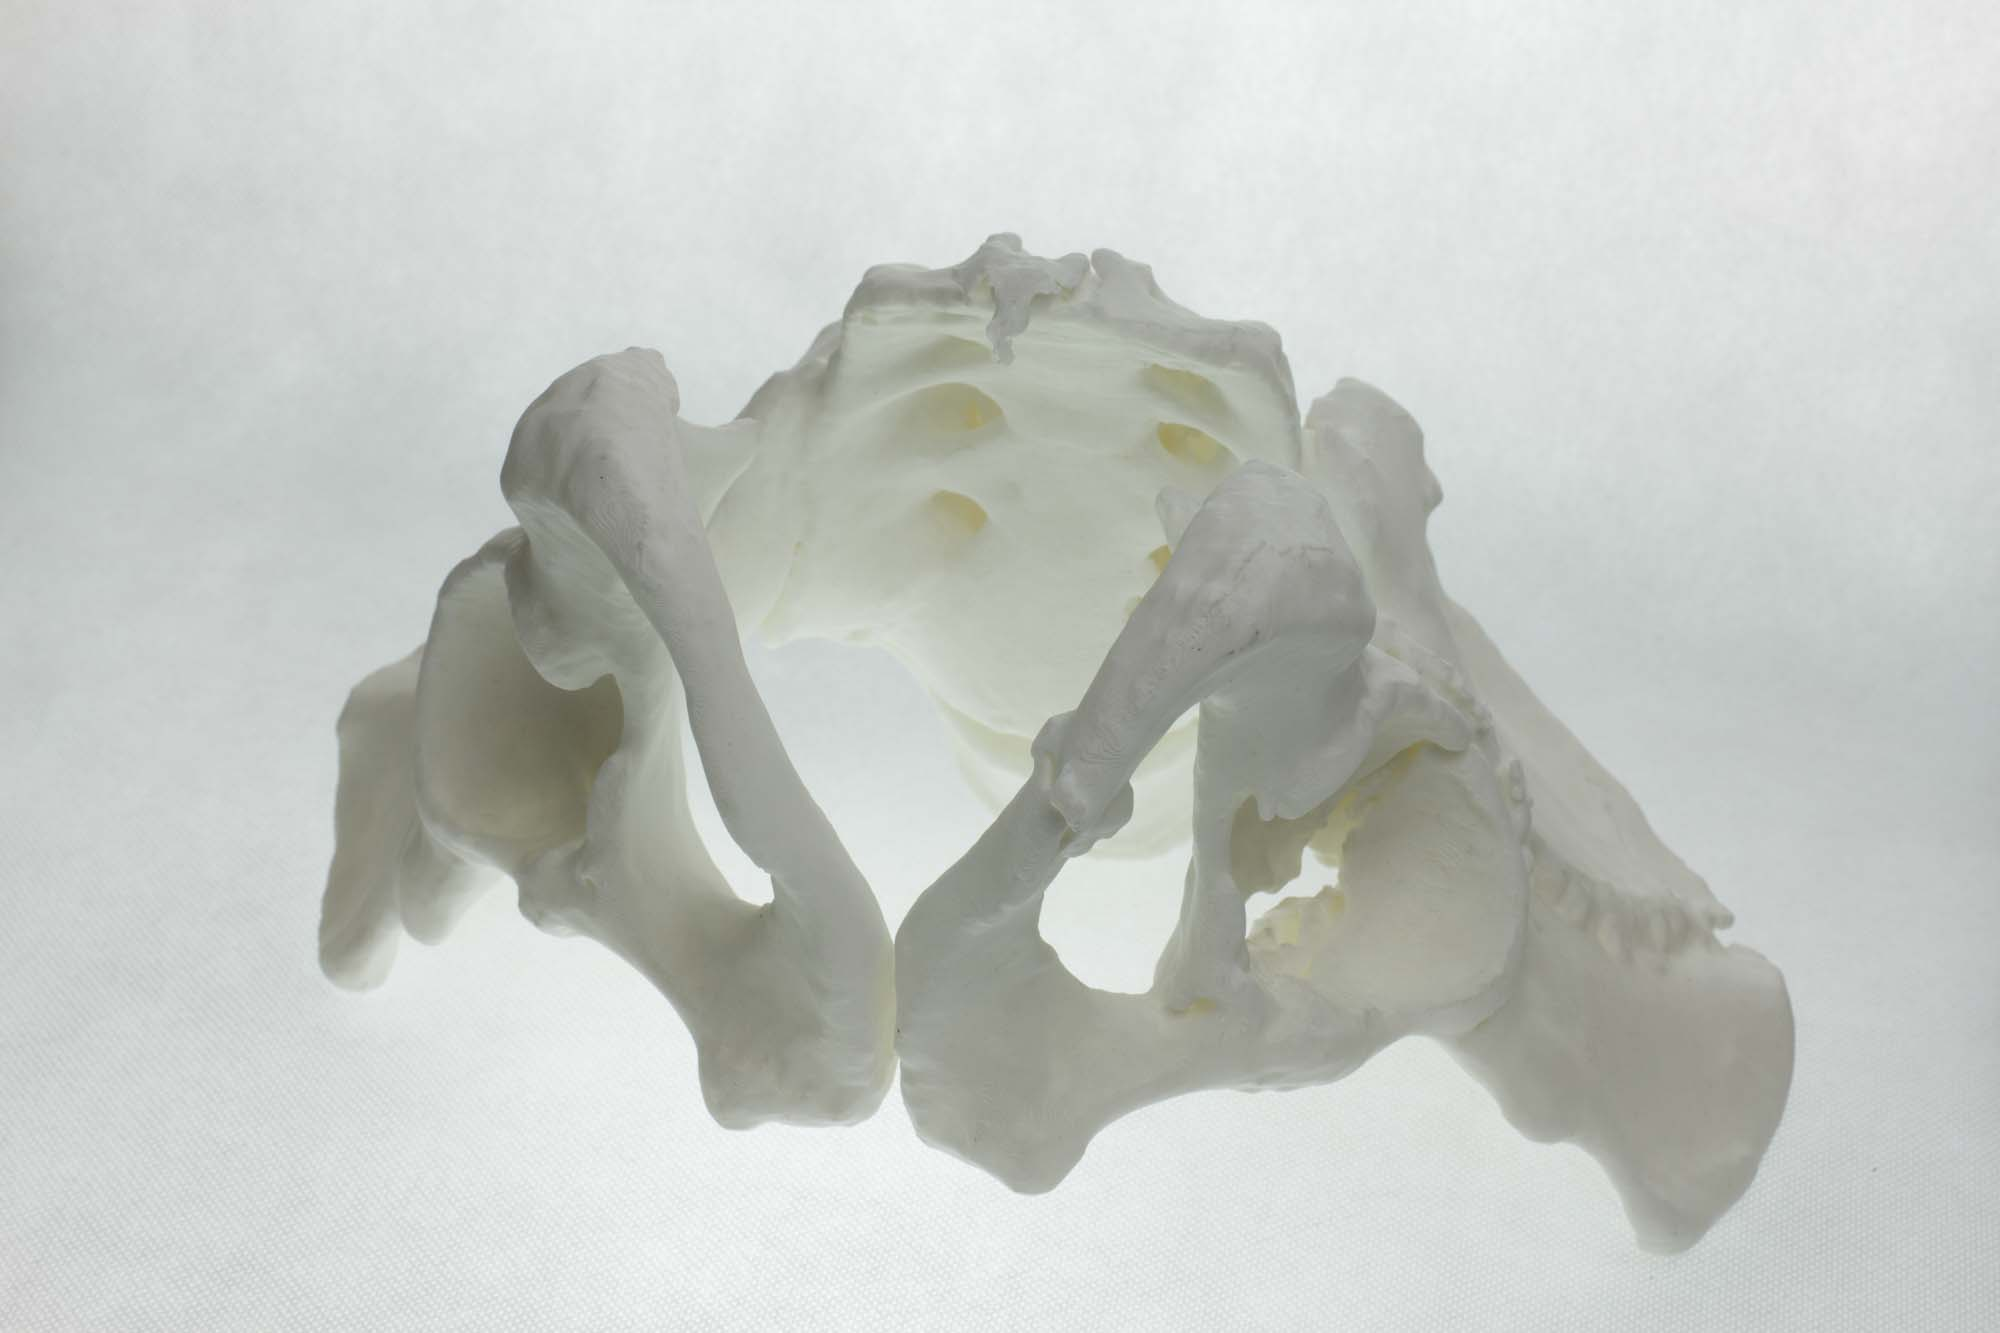 Large 3D printing without warping or cracking